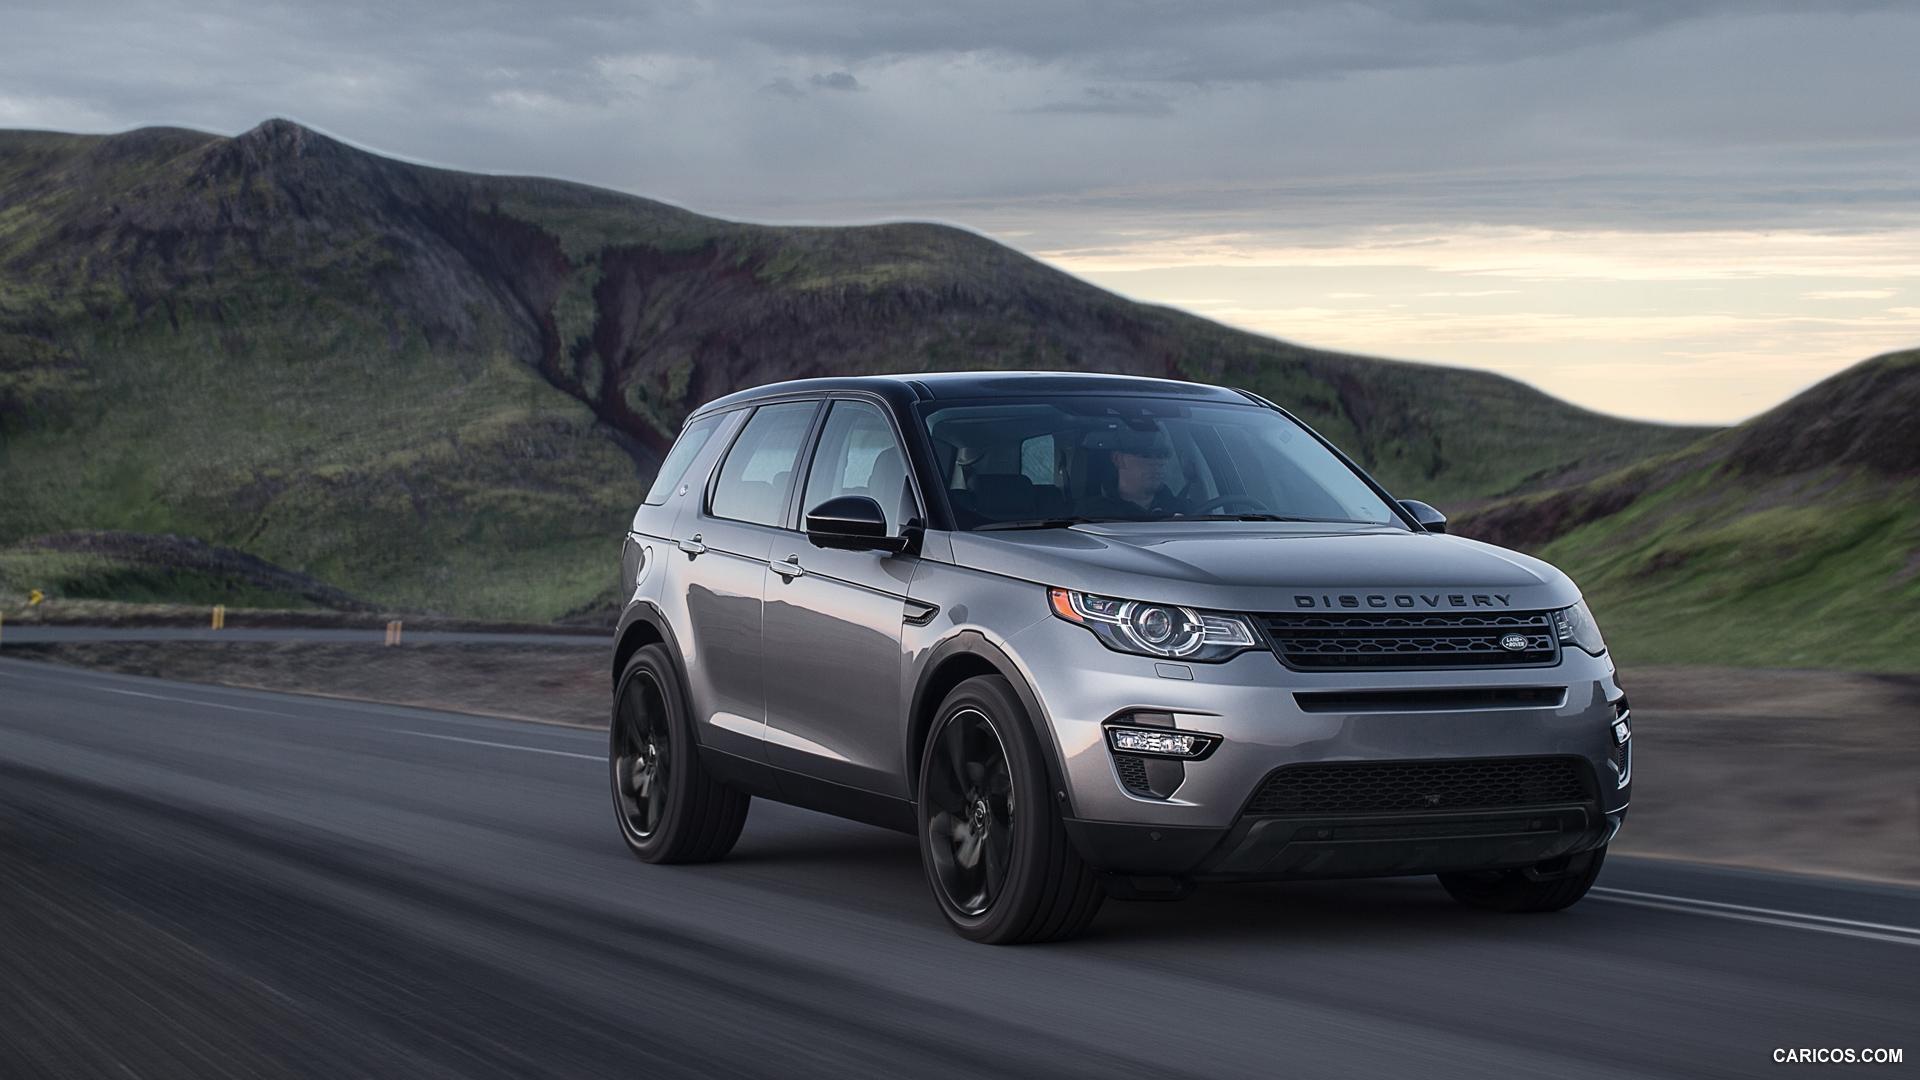 Filtru de particule diesel | Land Rover Maslak DPF